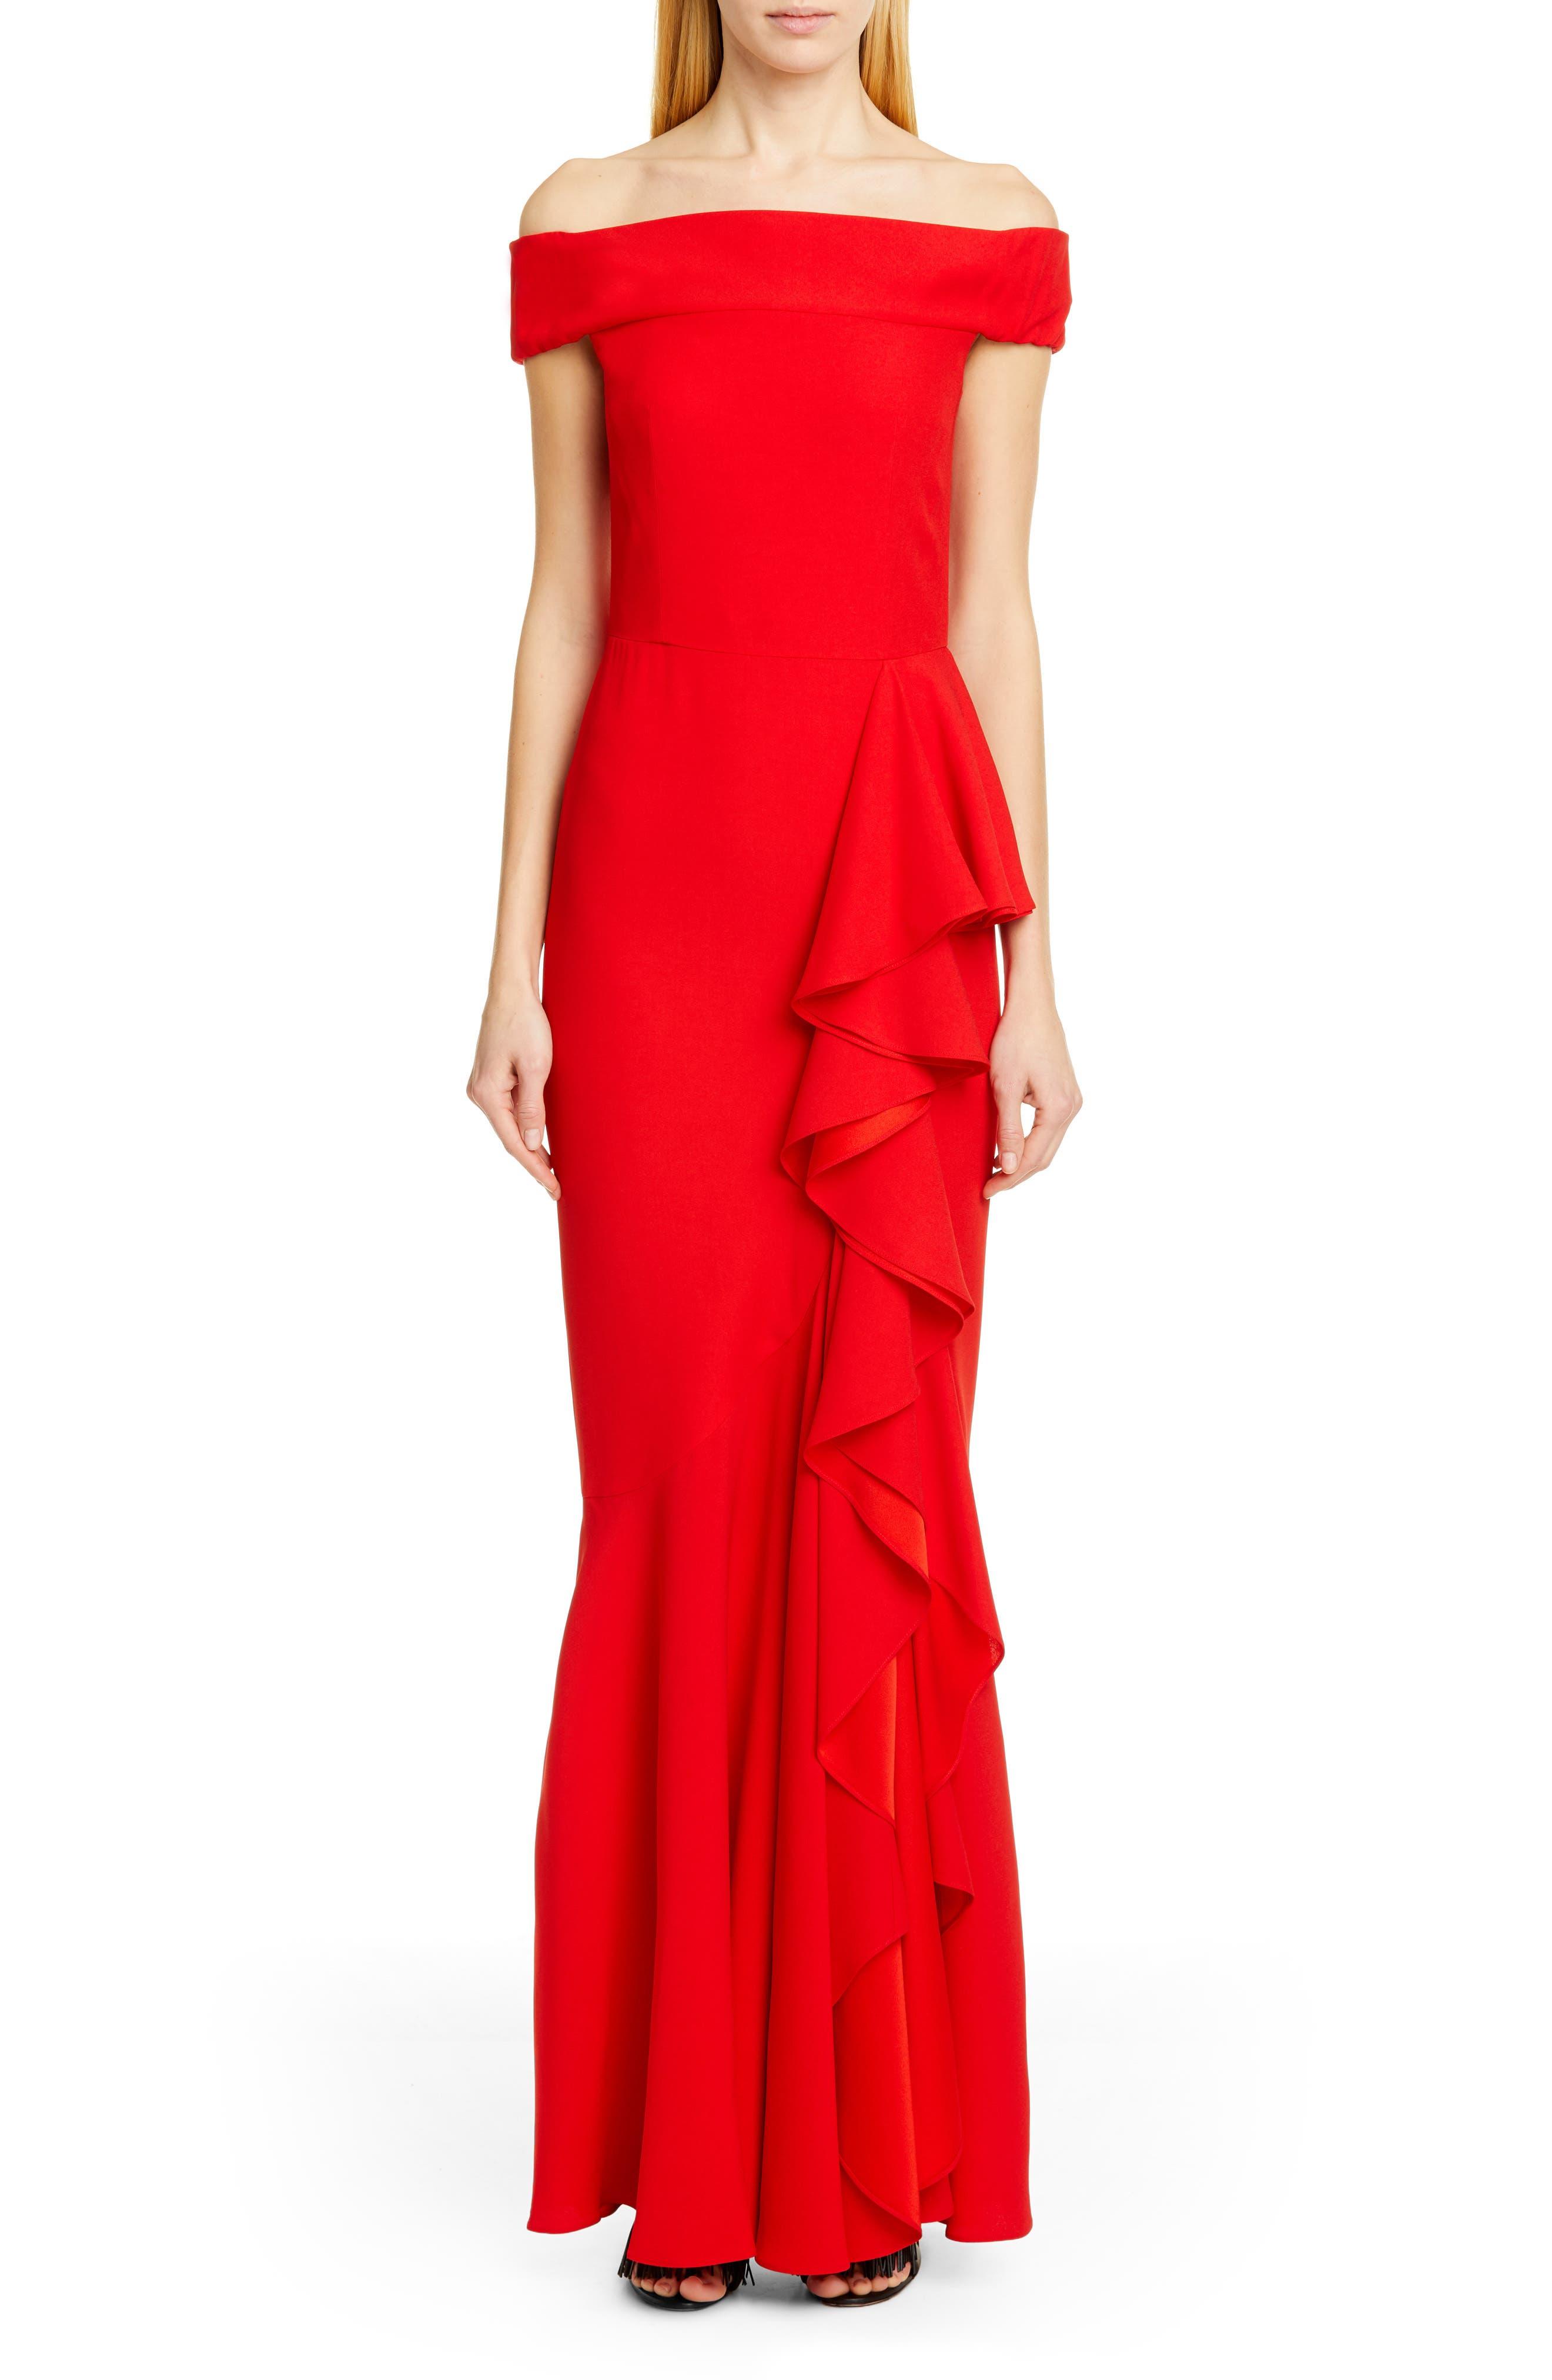 Alexander Mcqueen Ruffle Off The Shoulder Evening Dress, US / 42 IT - Red